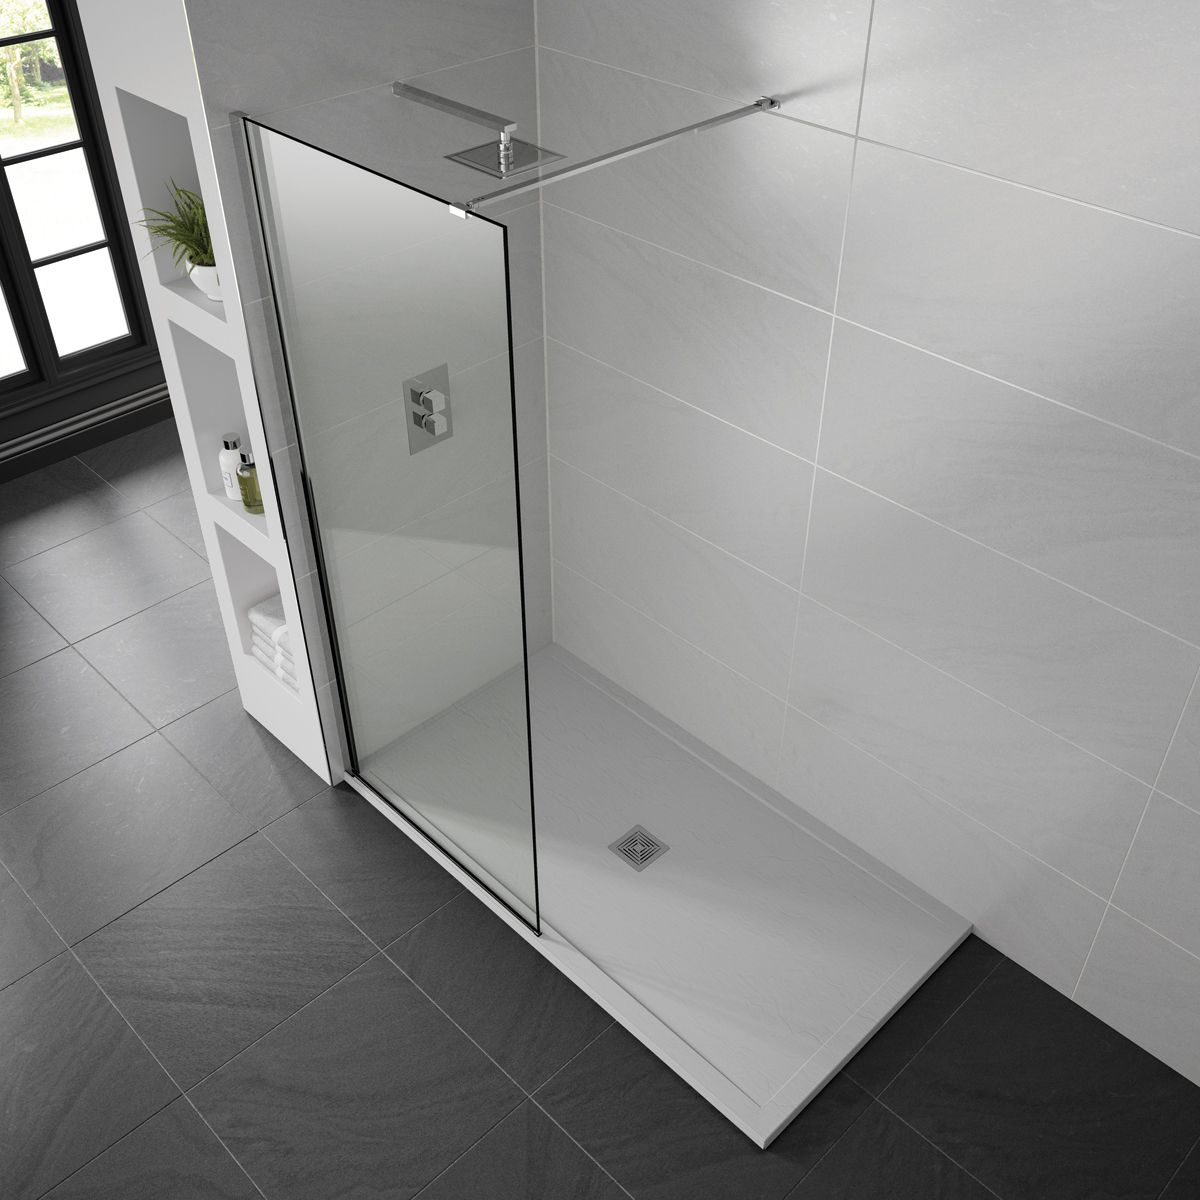 Aquadart White Slate Shower Tray 1200 x 760 Lifestyle